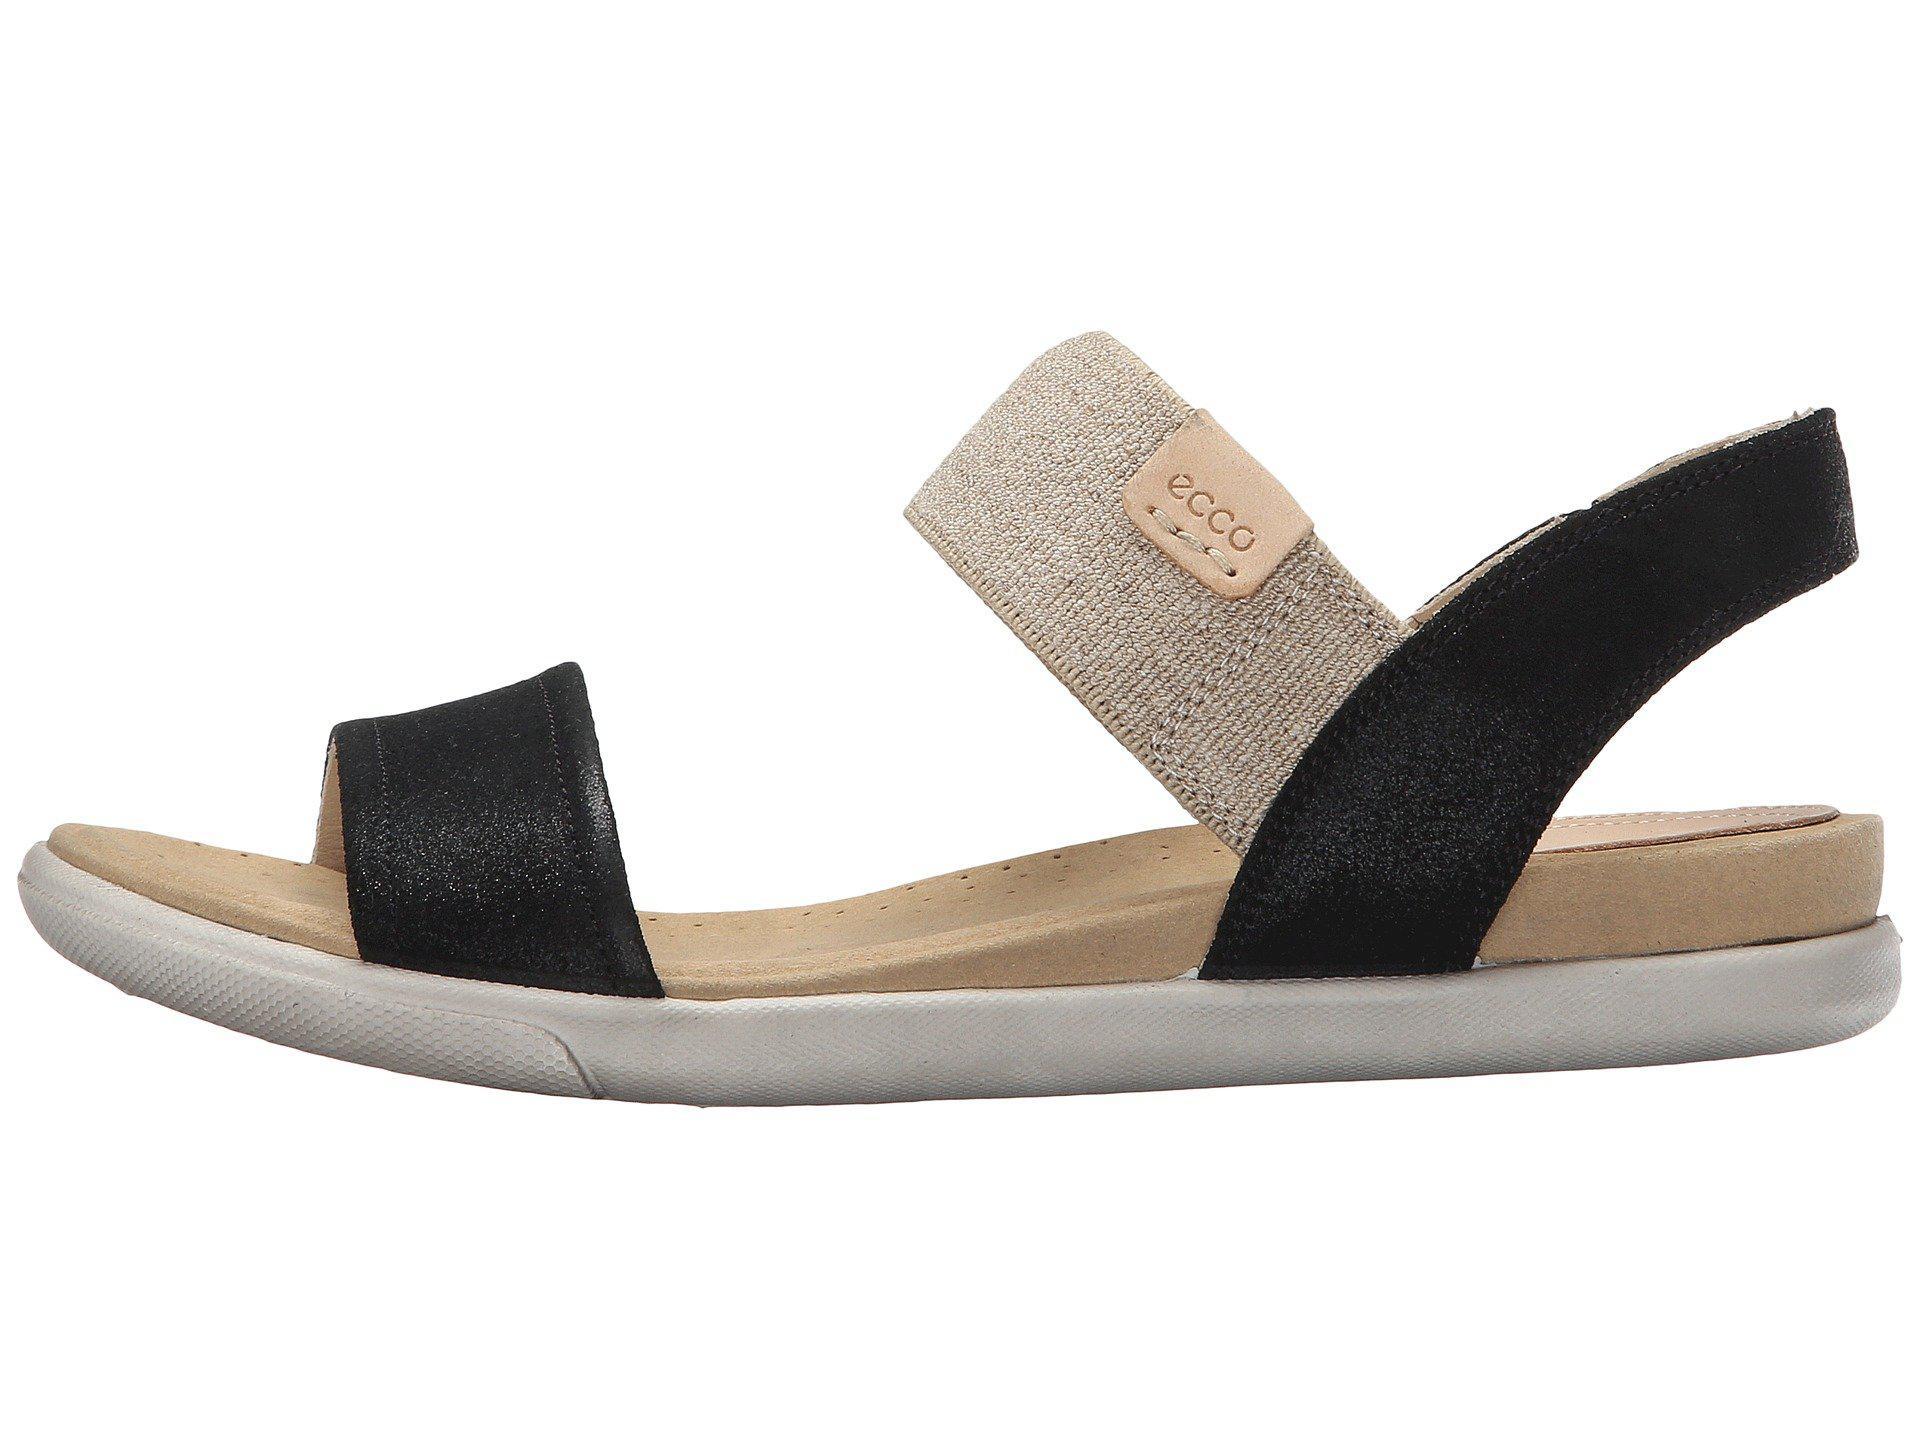 Ecco Leather Damara Ankle Sandal in